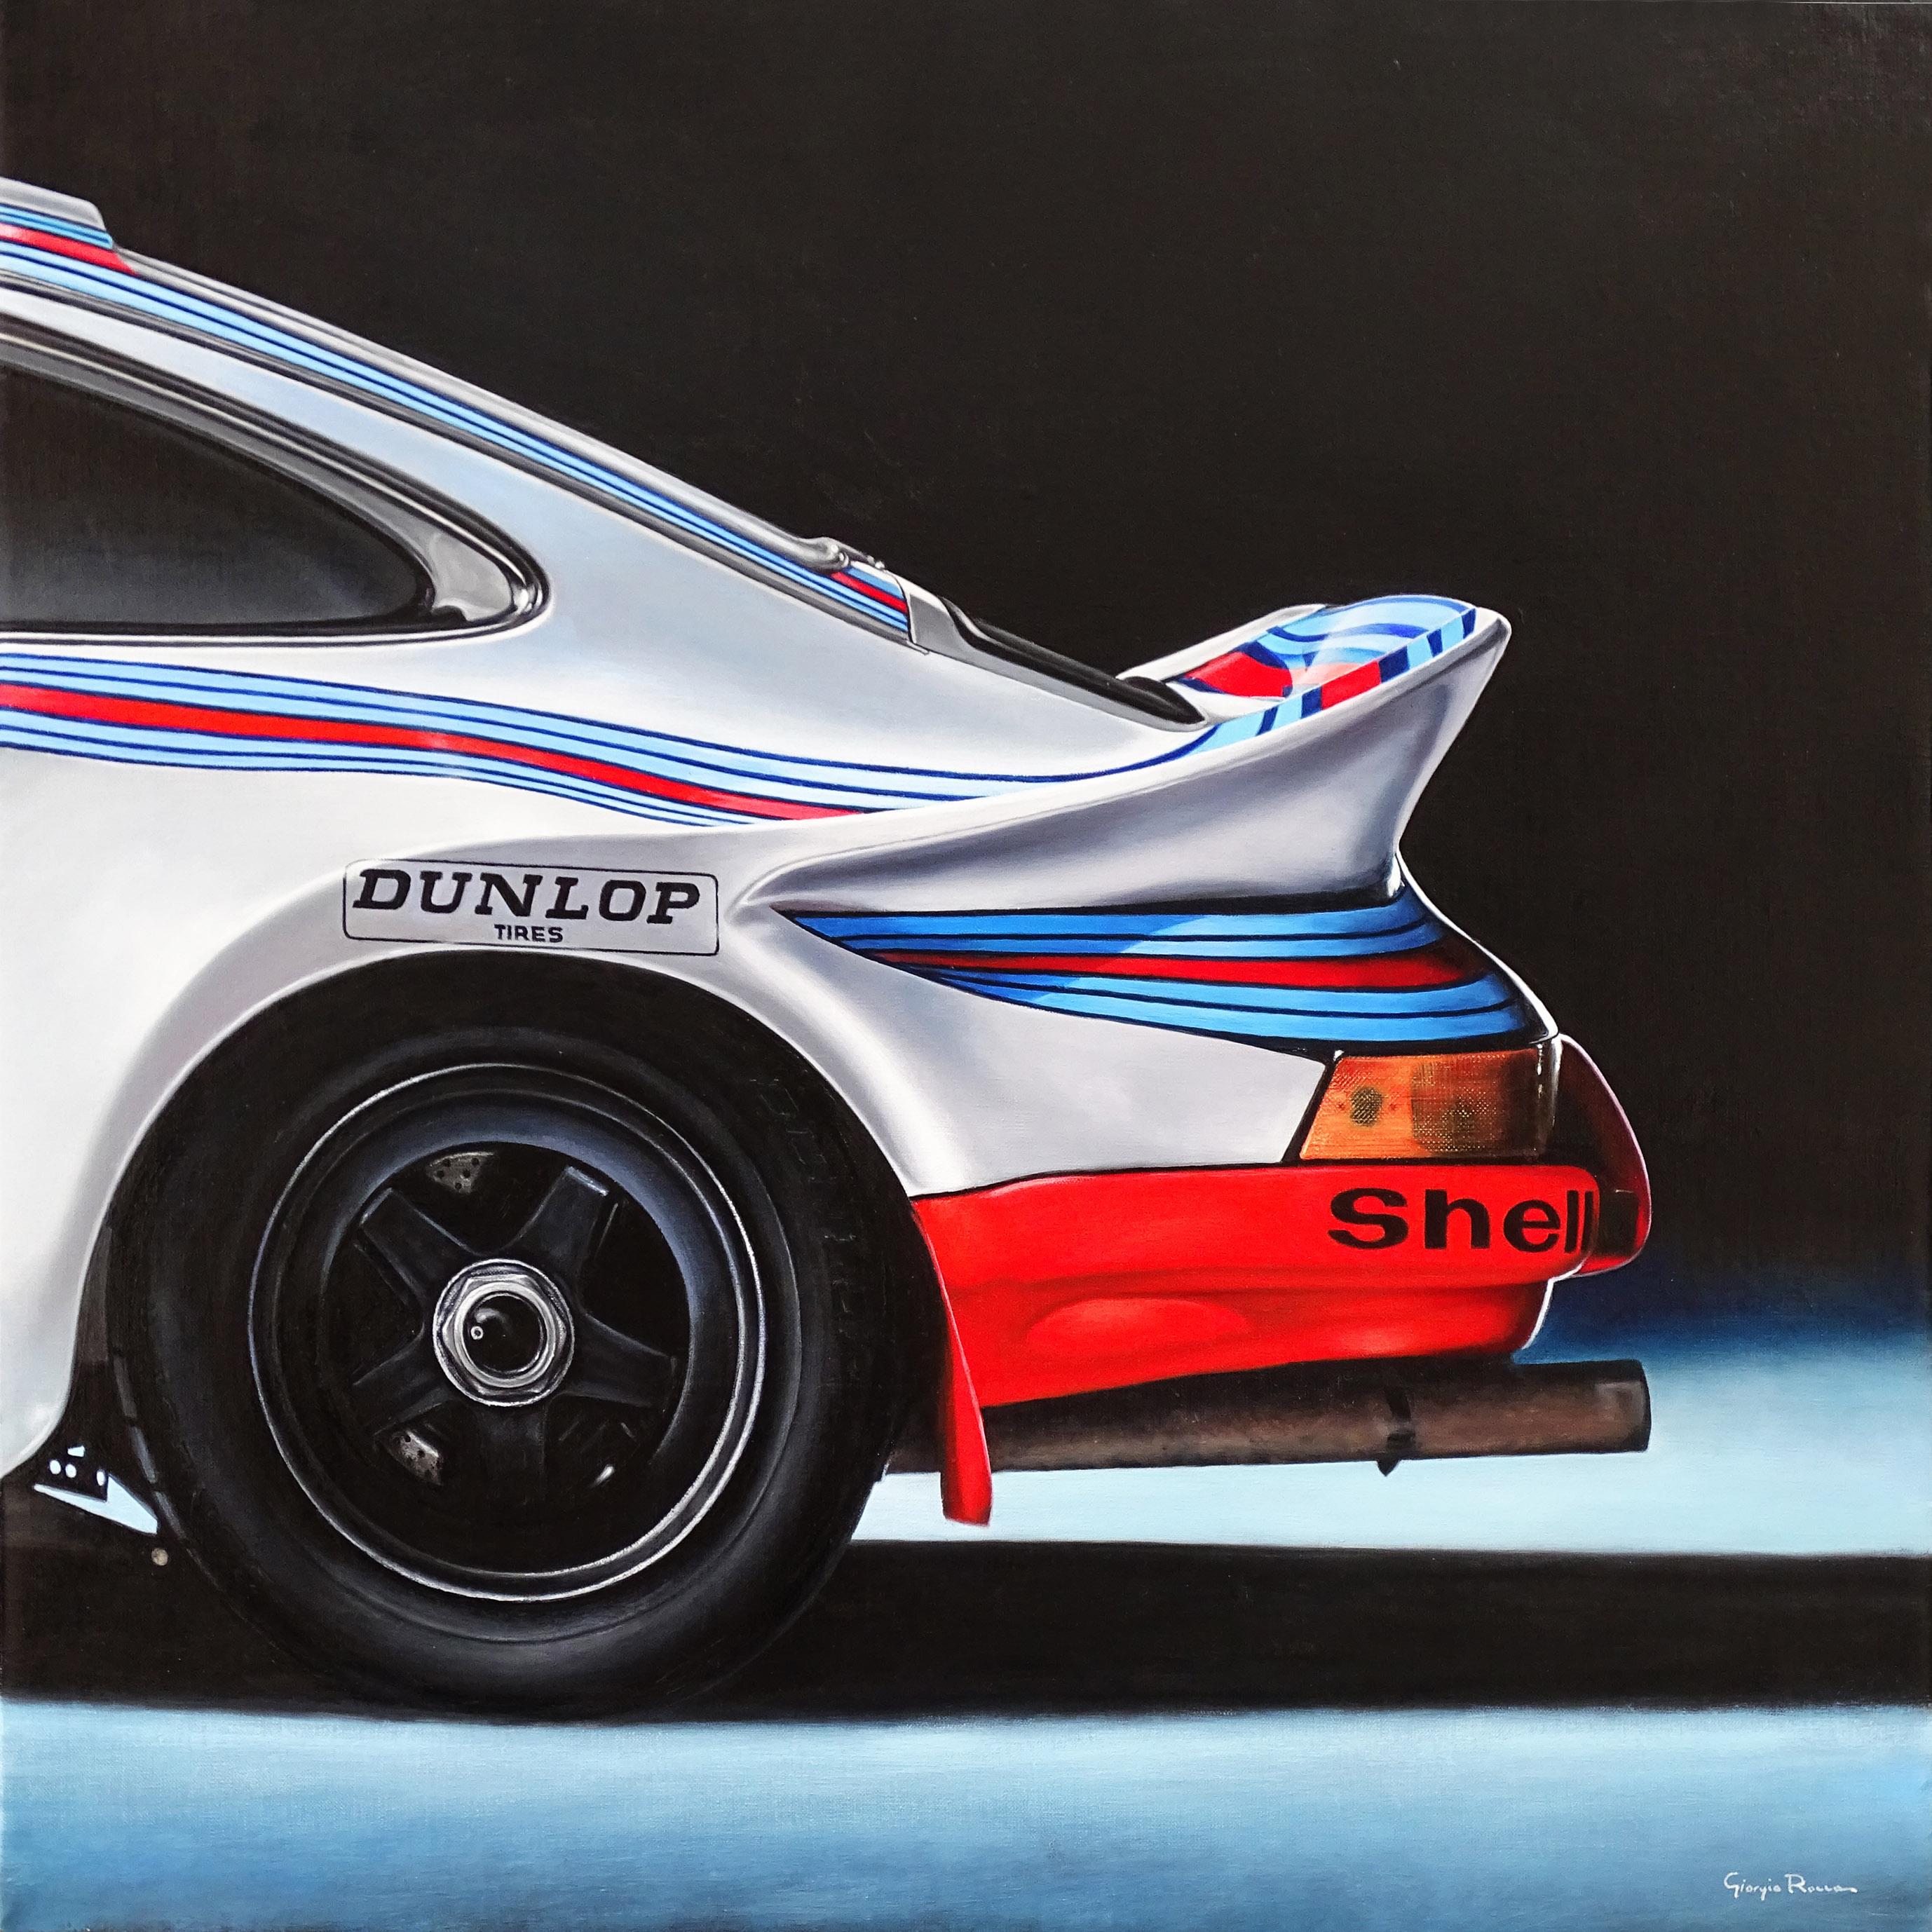 Giorgio Rocca - Porsche Martini Racing , 7092-006-060